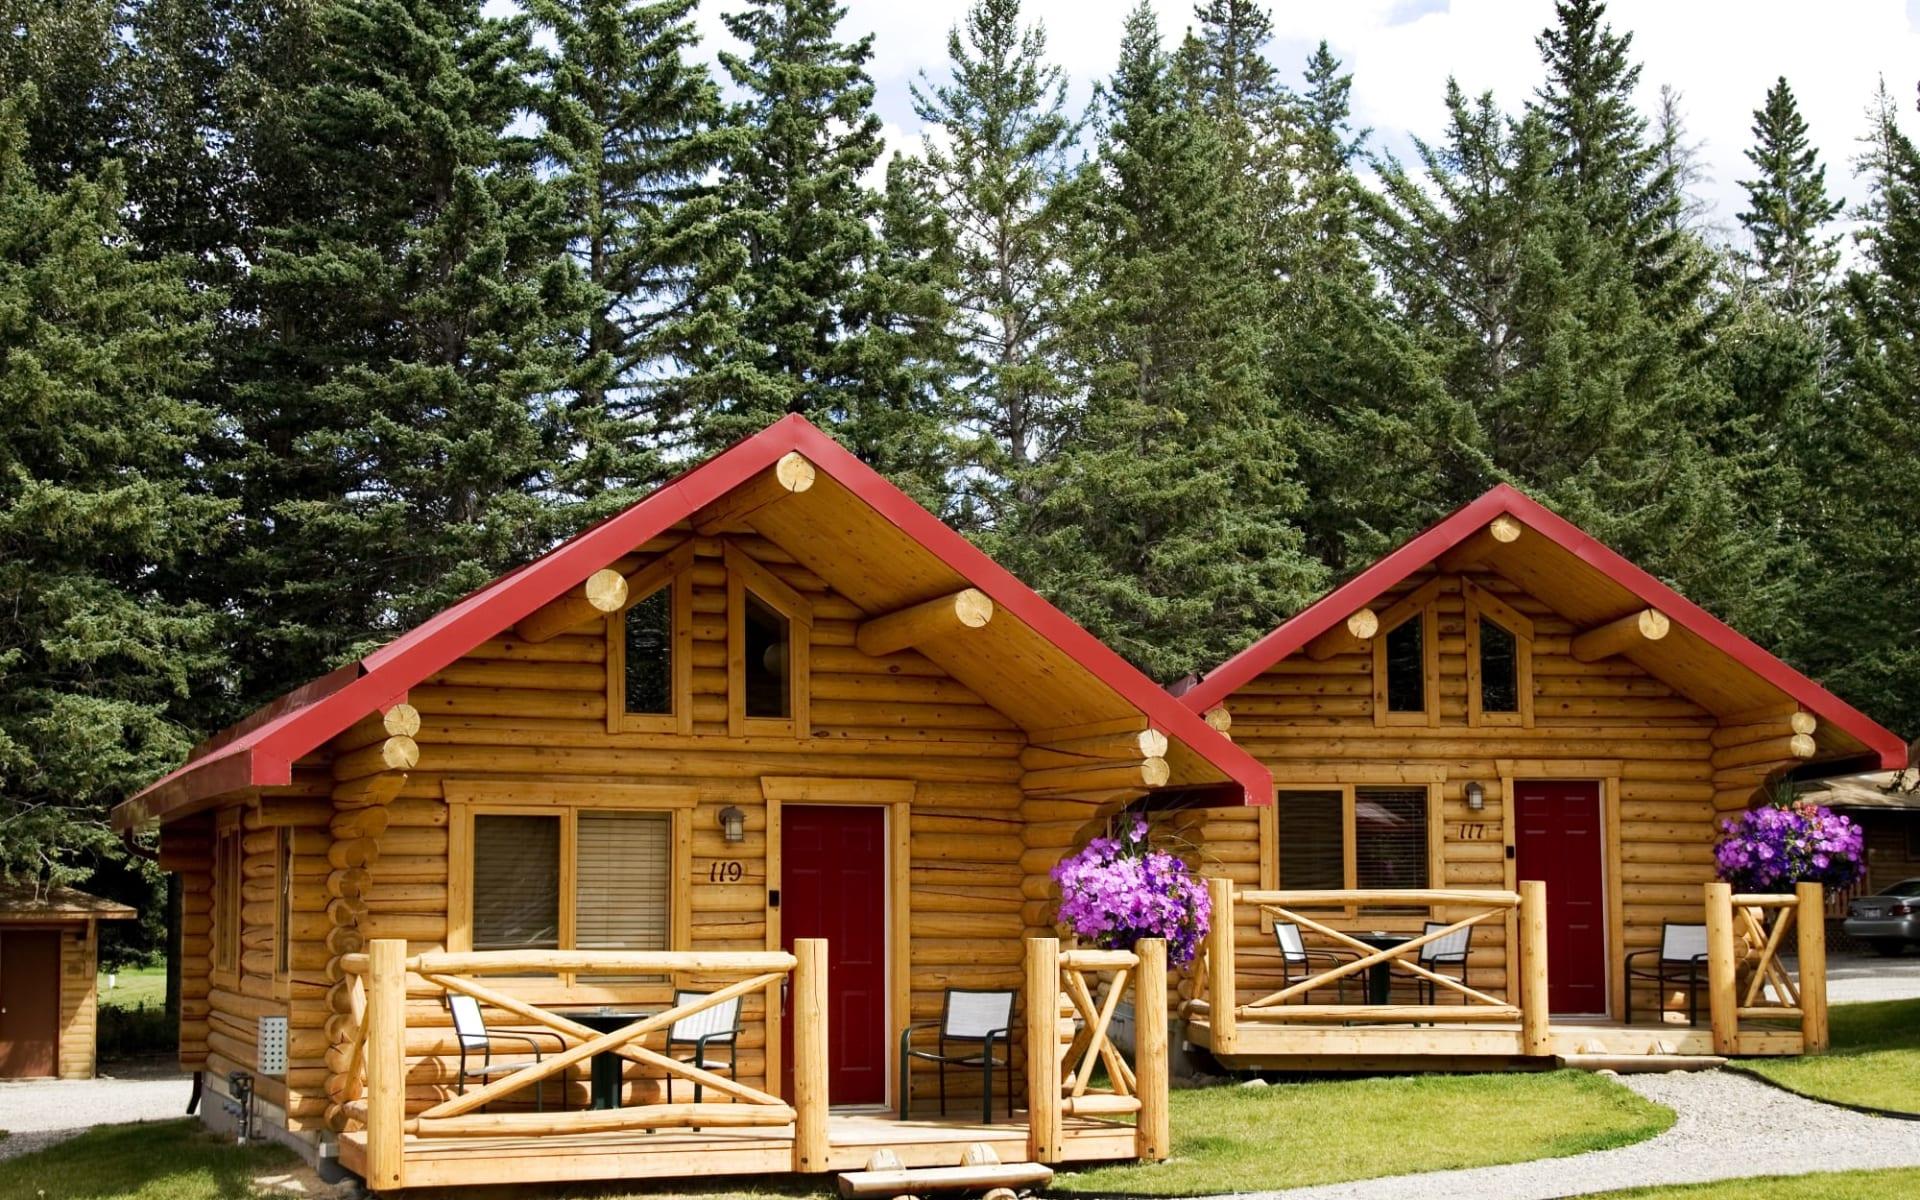 Pocahontas Cabins in Jasper:  PocahontasCabins_DeluxeLogCabin